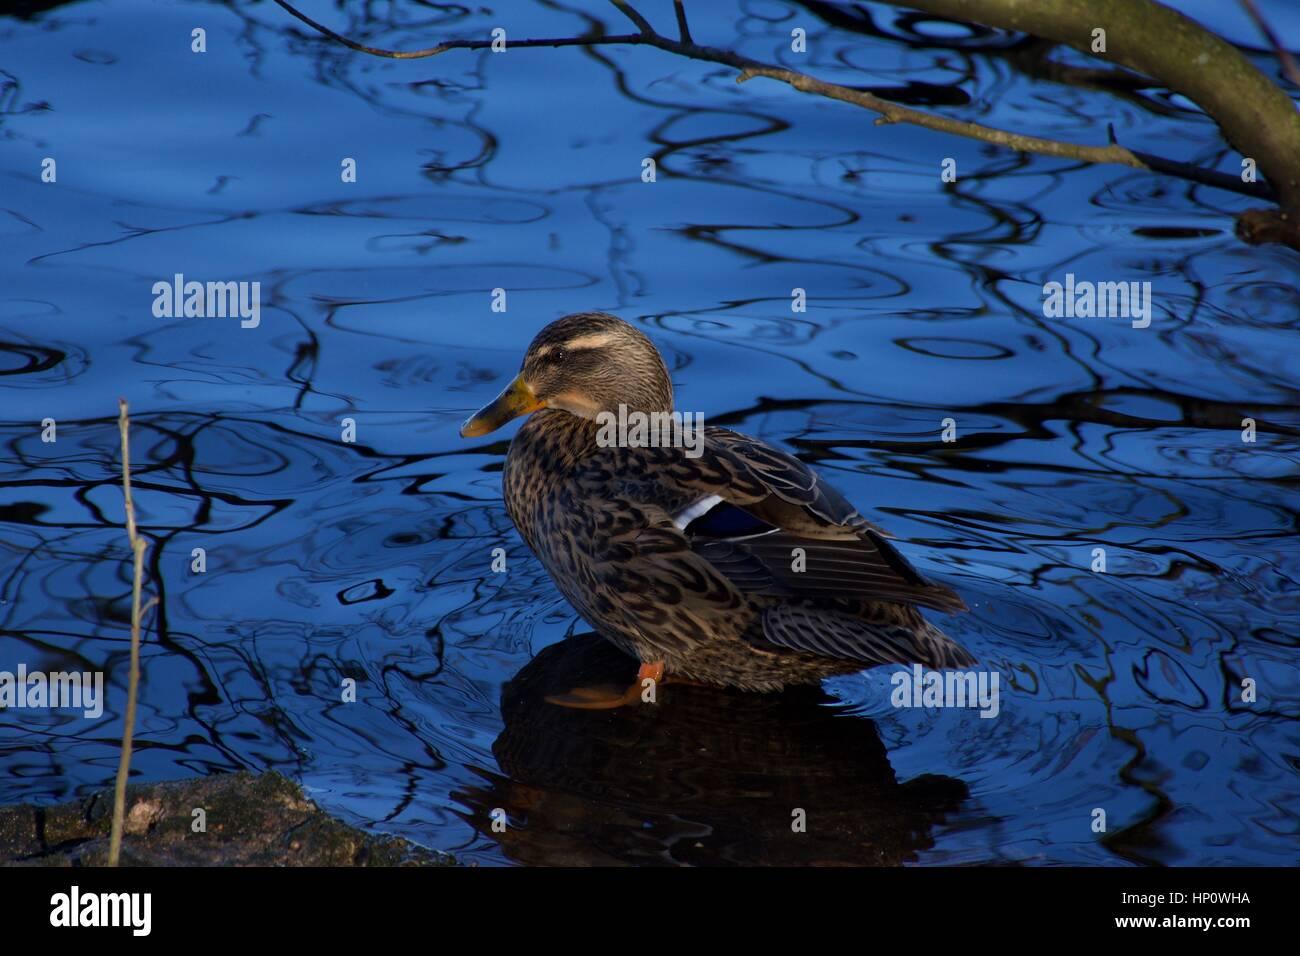 Pato de pie en agua azul,Westport lago reserva natural en invierno,Stoke on Trent, Reino Unido.luz natural,sky reflection.Anas Imagen De Stock